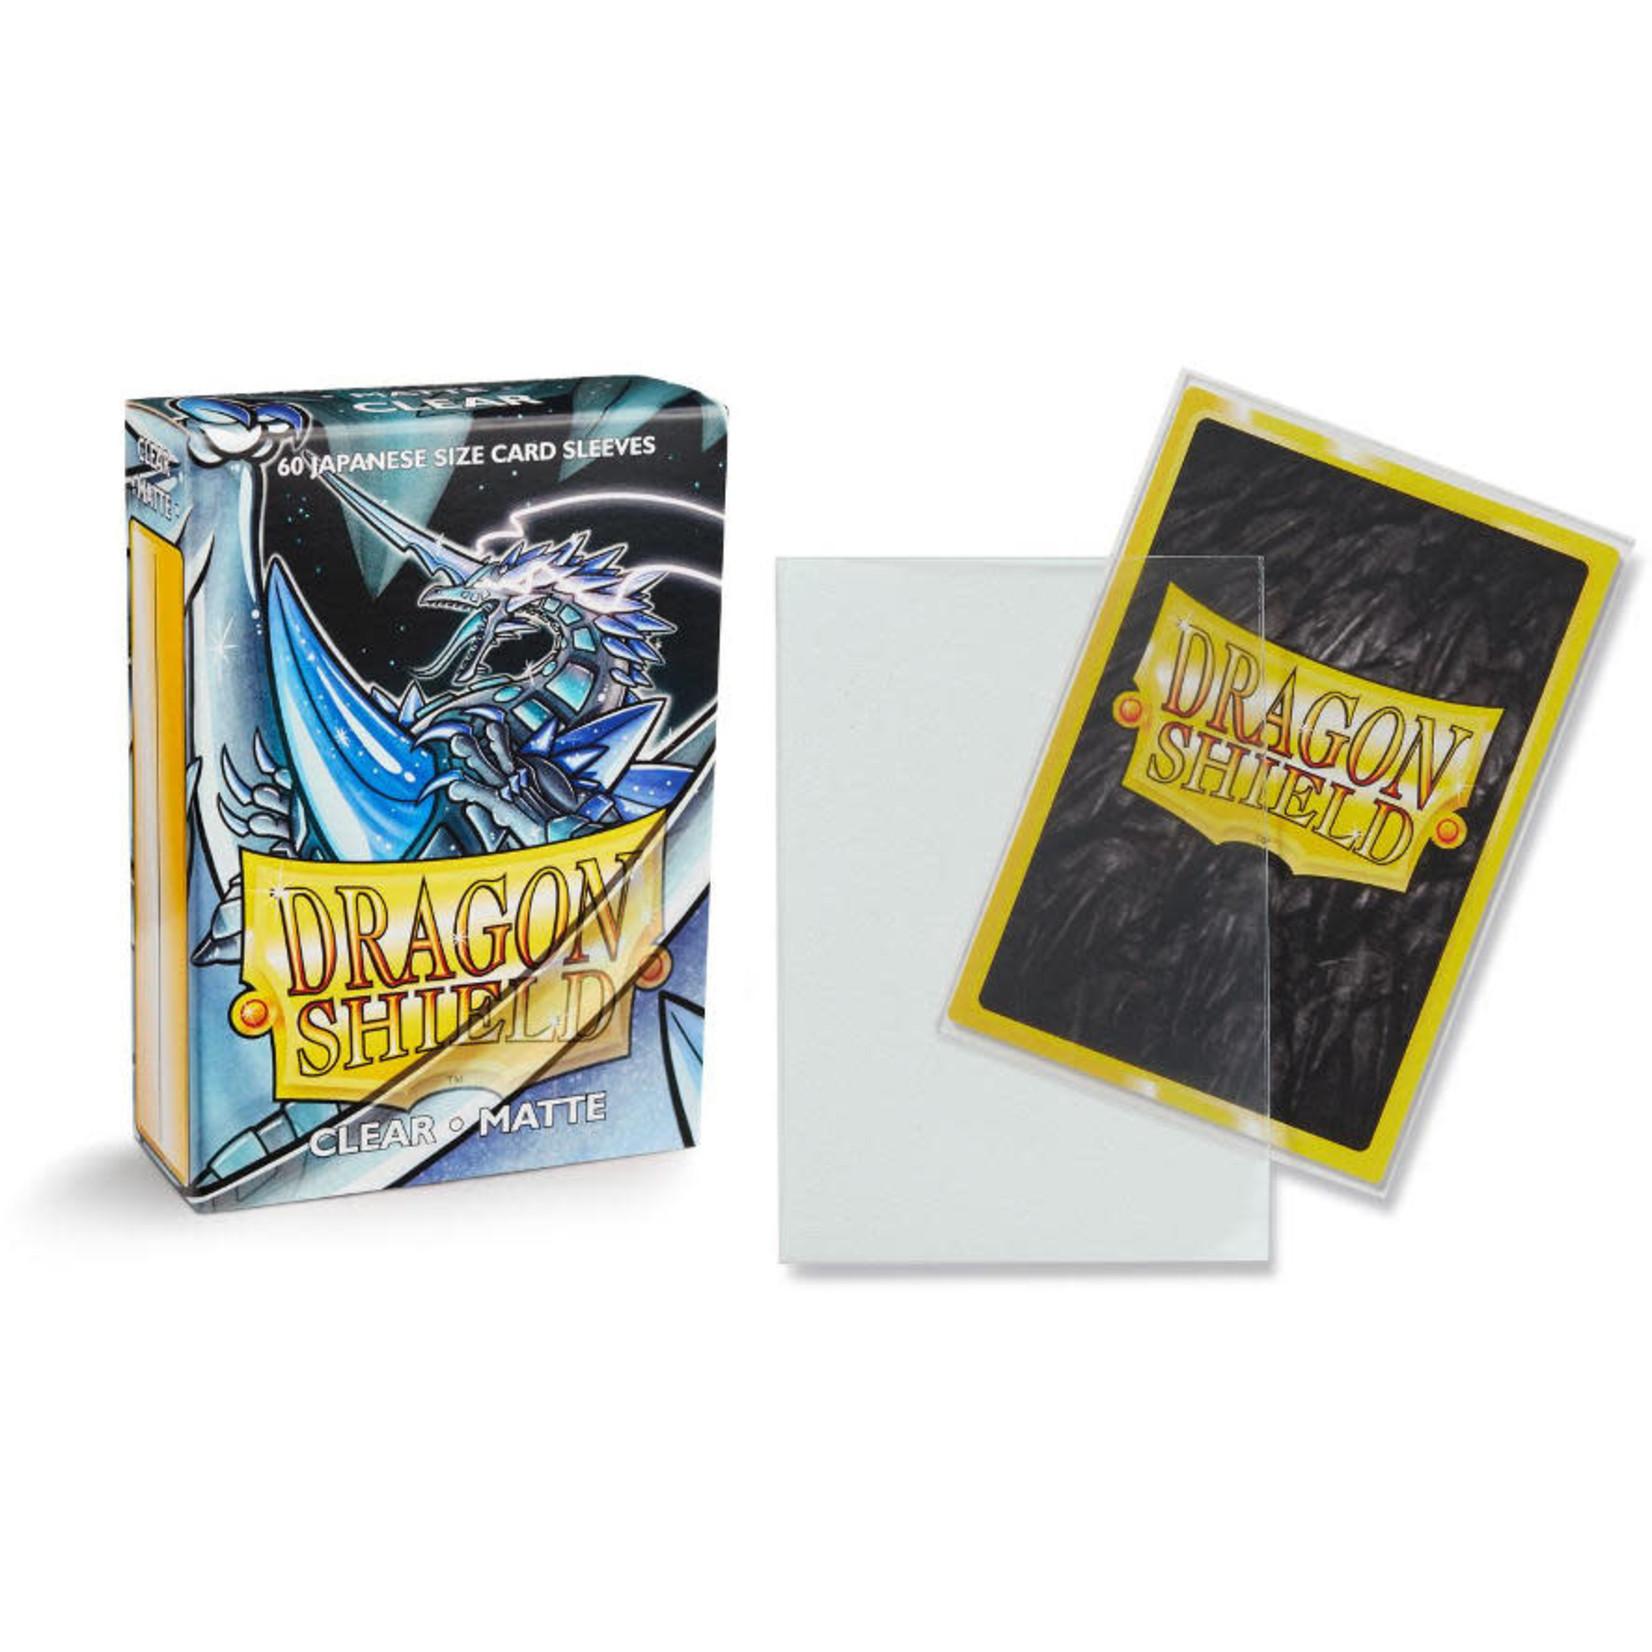 Dragon Shield Matte Clear (60 count) Small